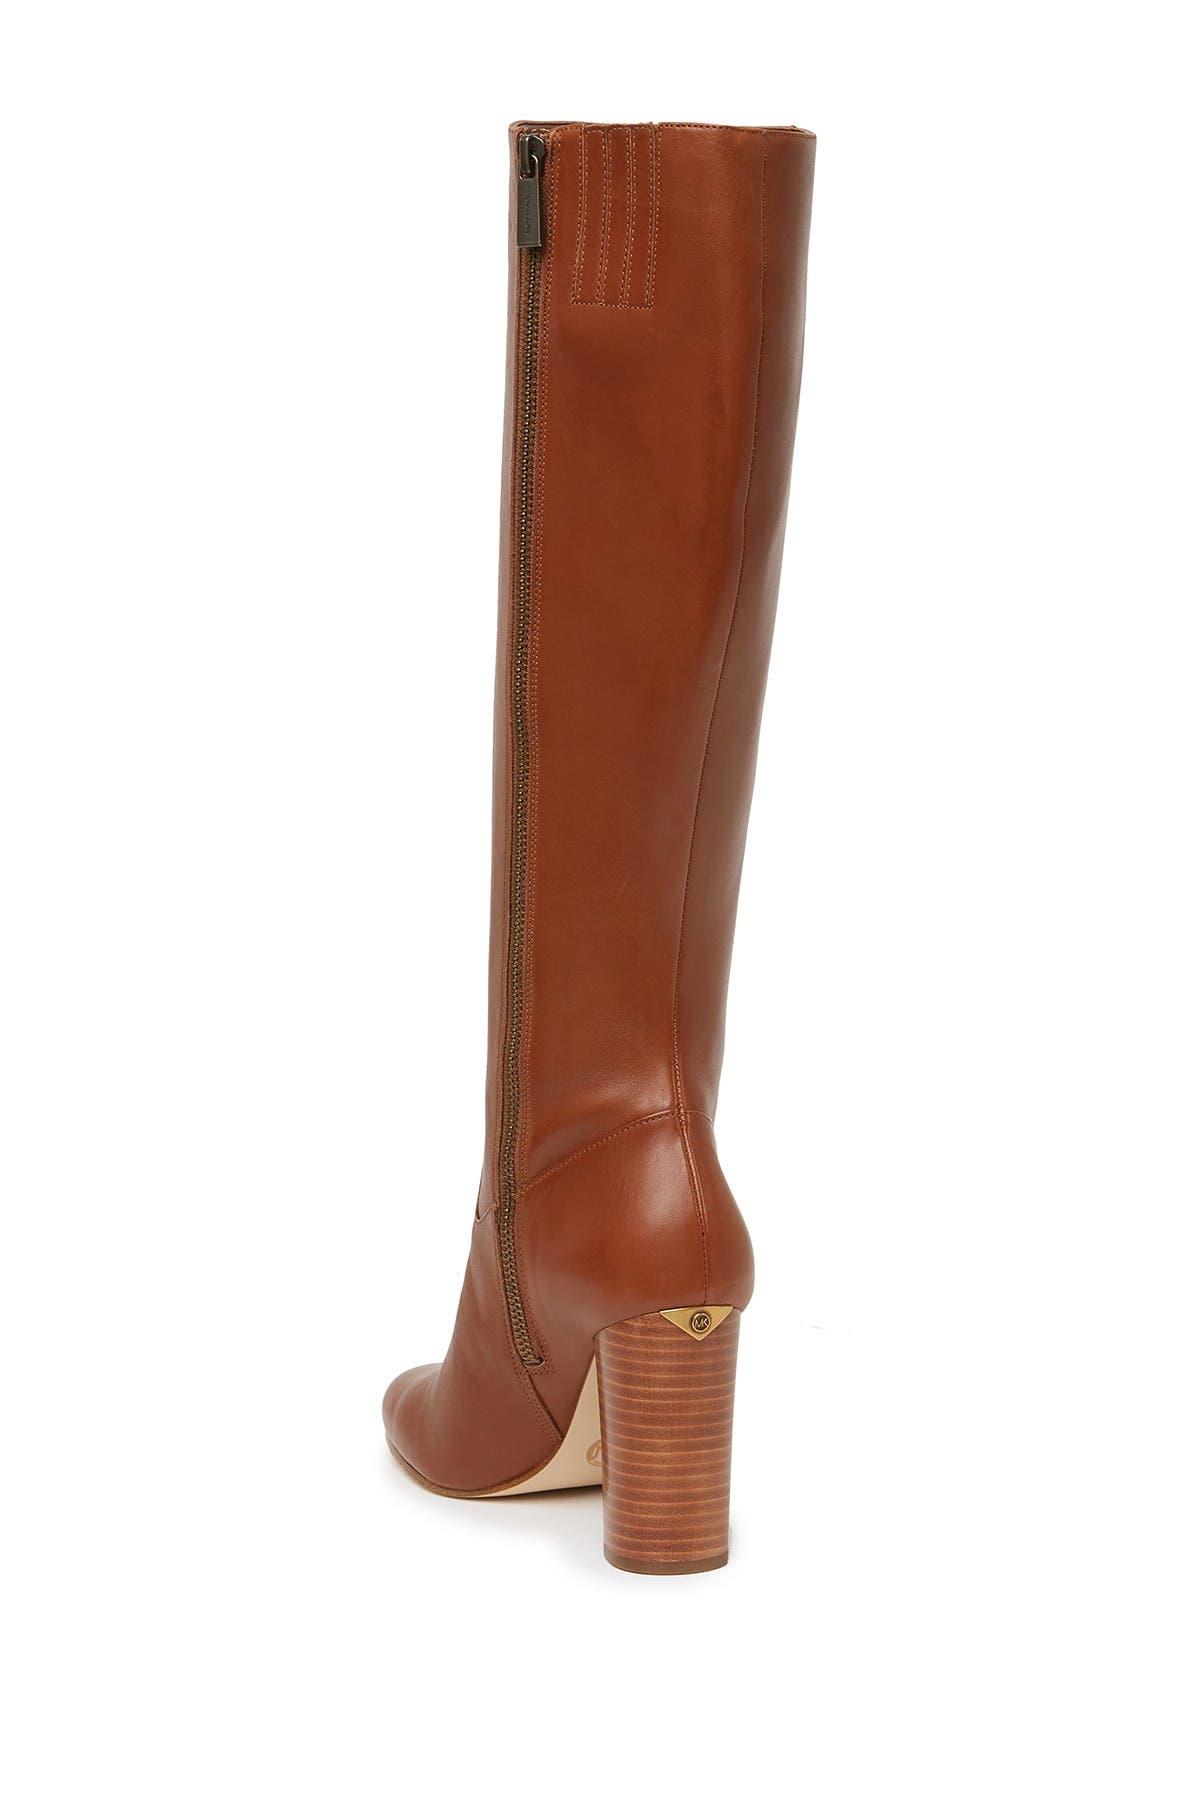 Image of MICHAEL Michael Kors Lottie Knee High Boot